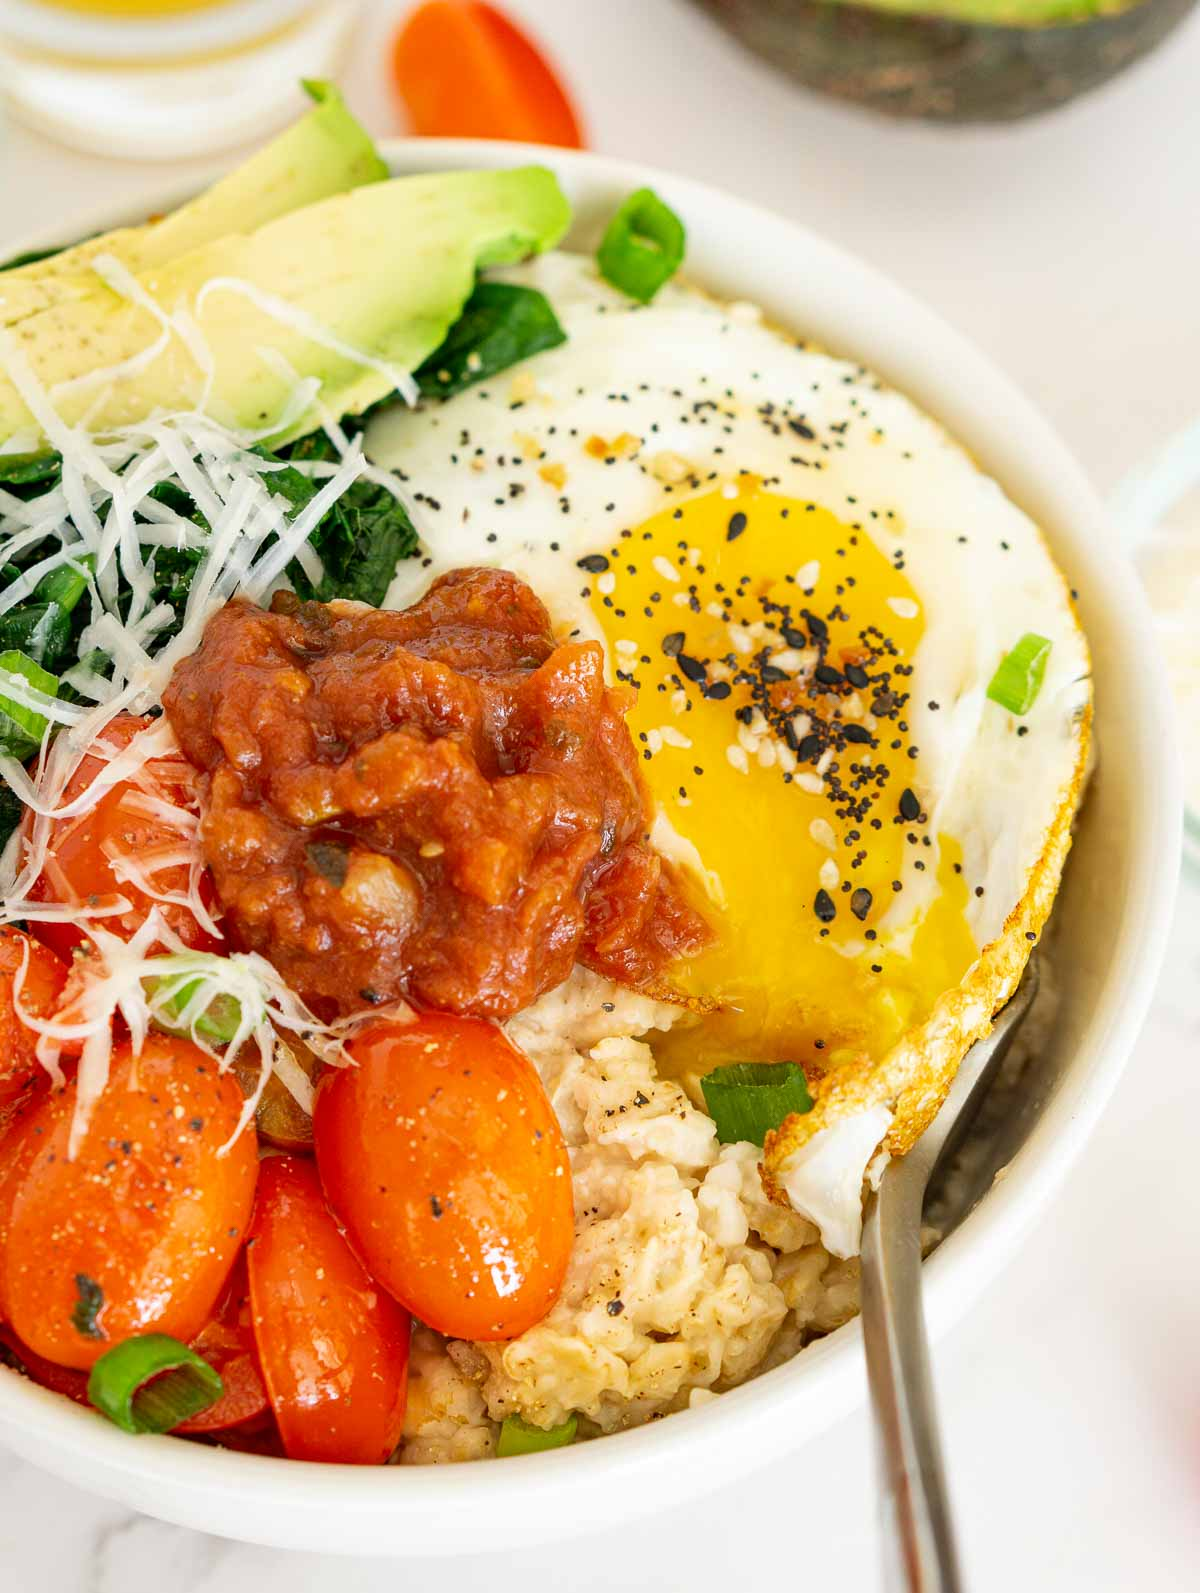 Savory oatmeal bowl with salsa and fried egg.